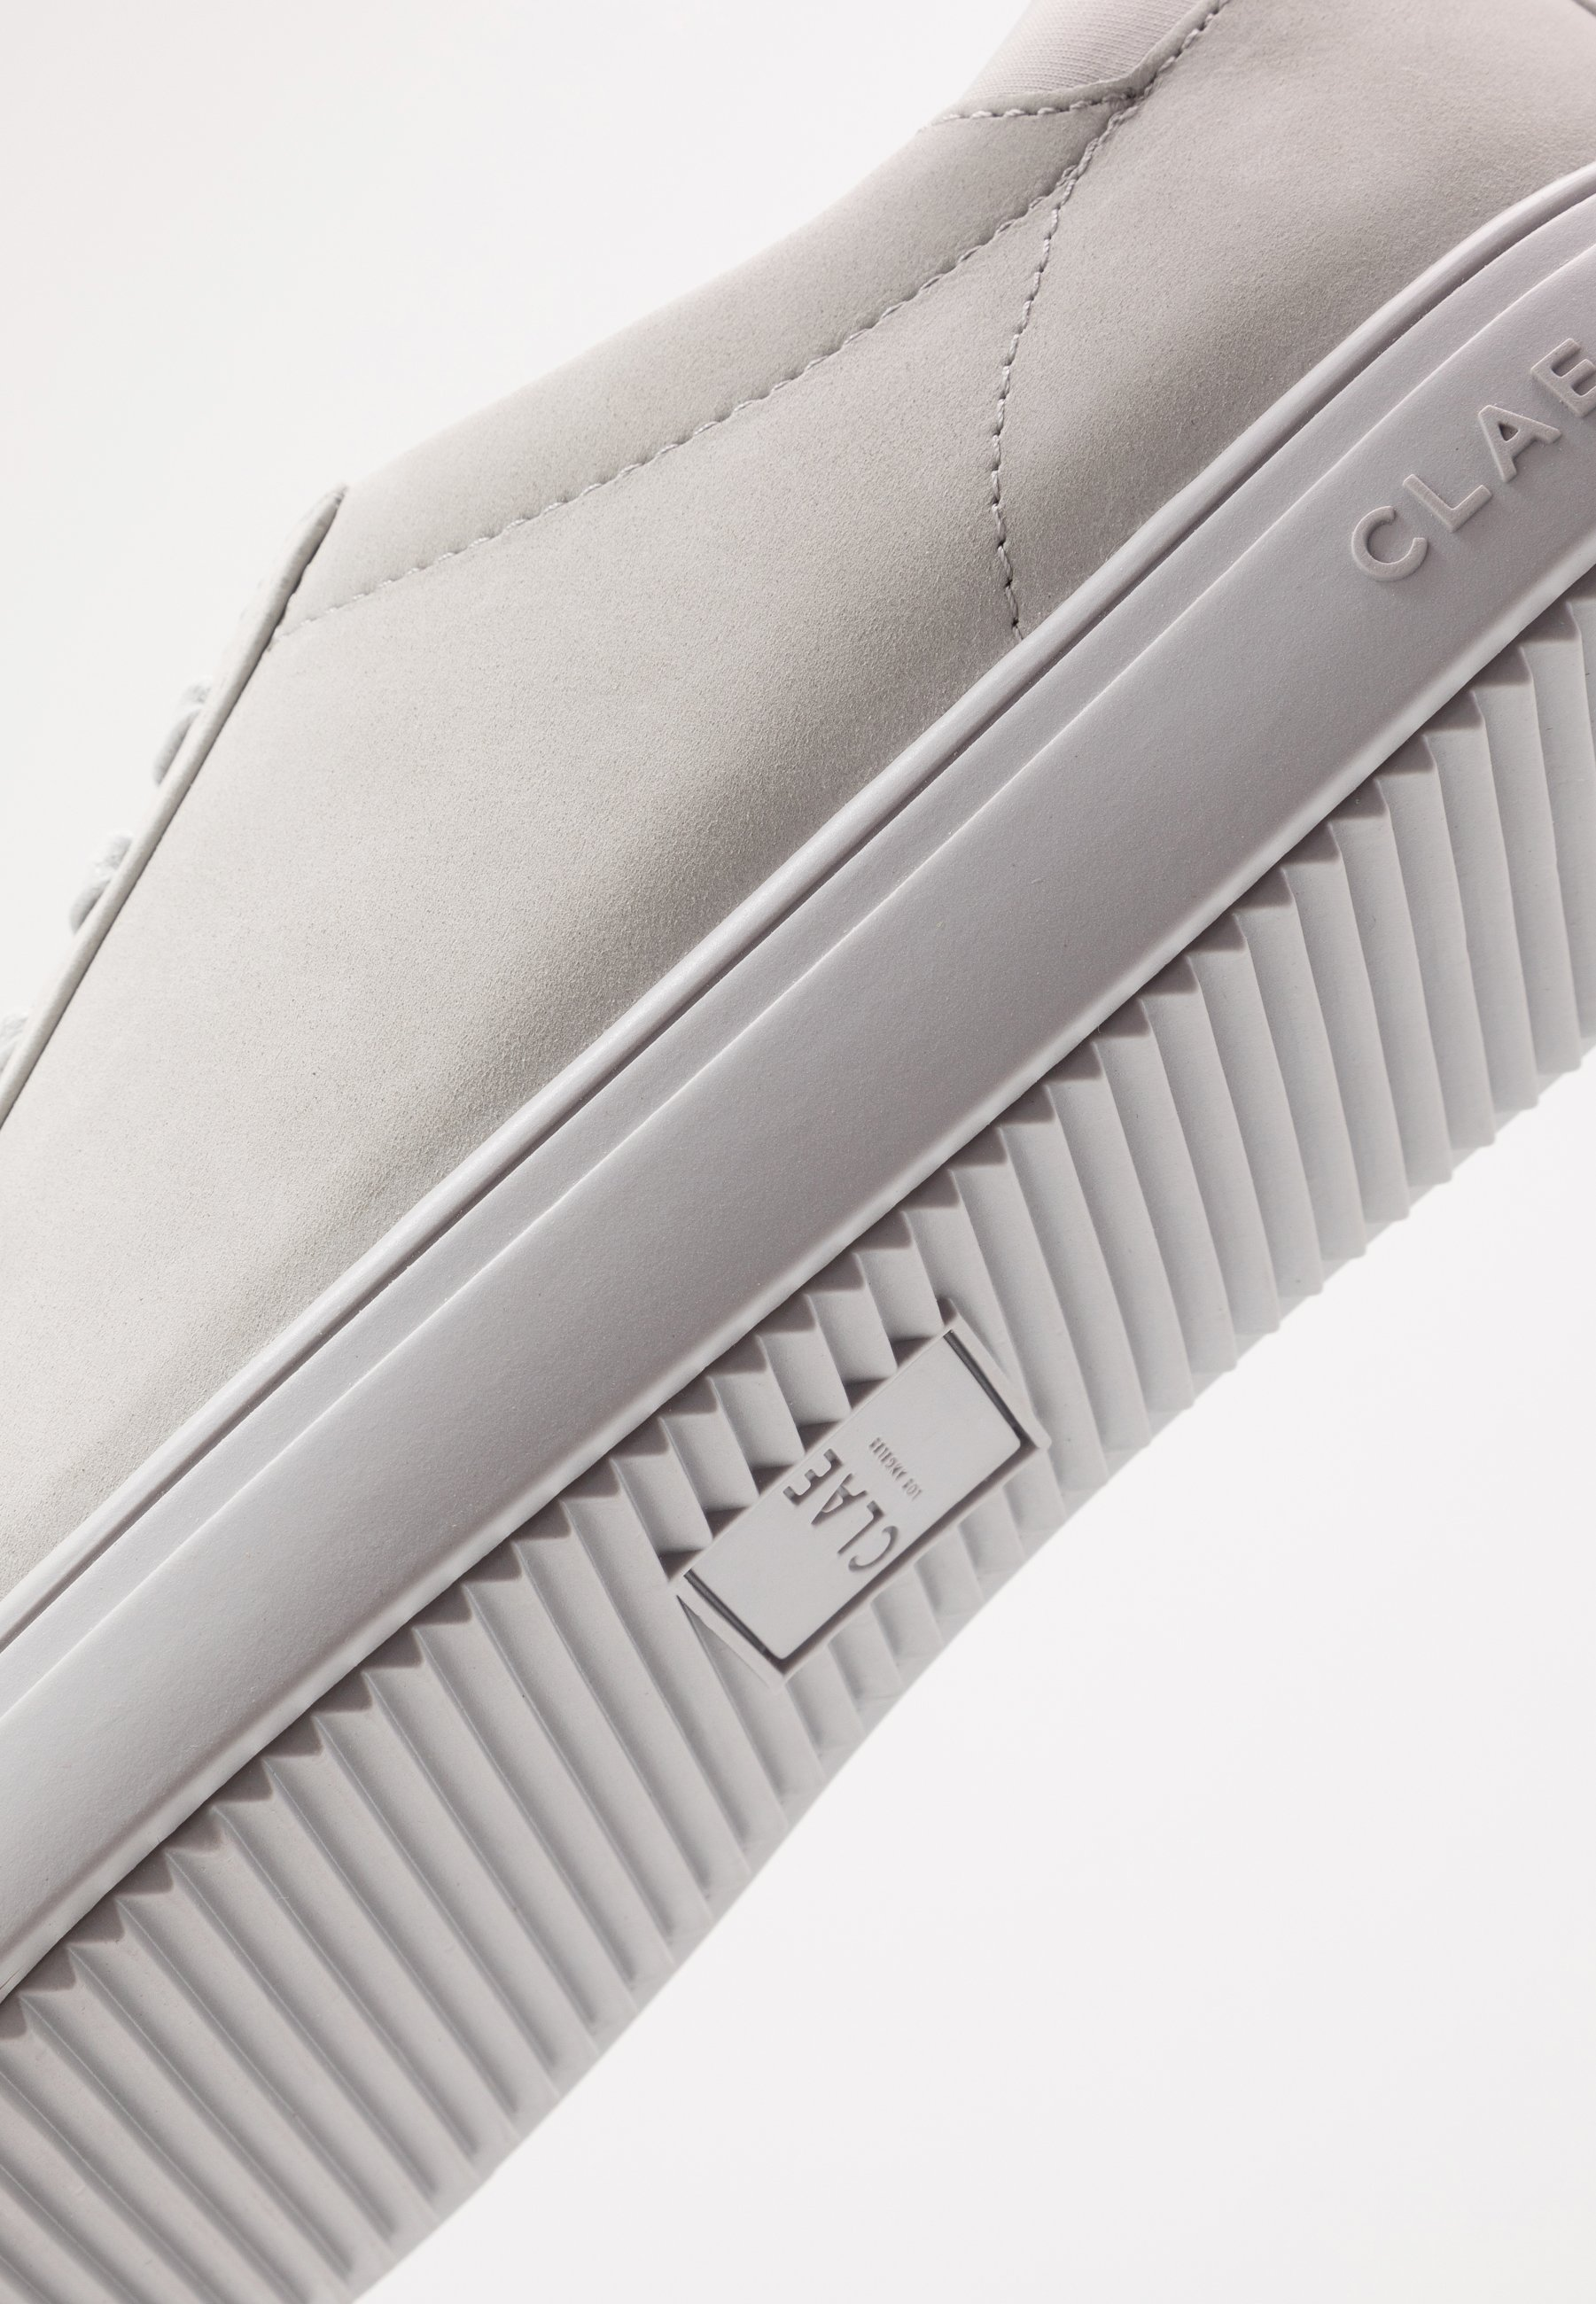 Clae Bradley - Sneakers Basse Microgrey Scarpe Scontate